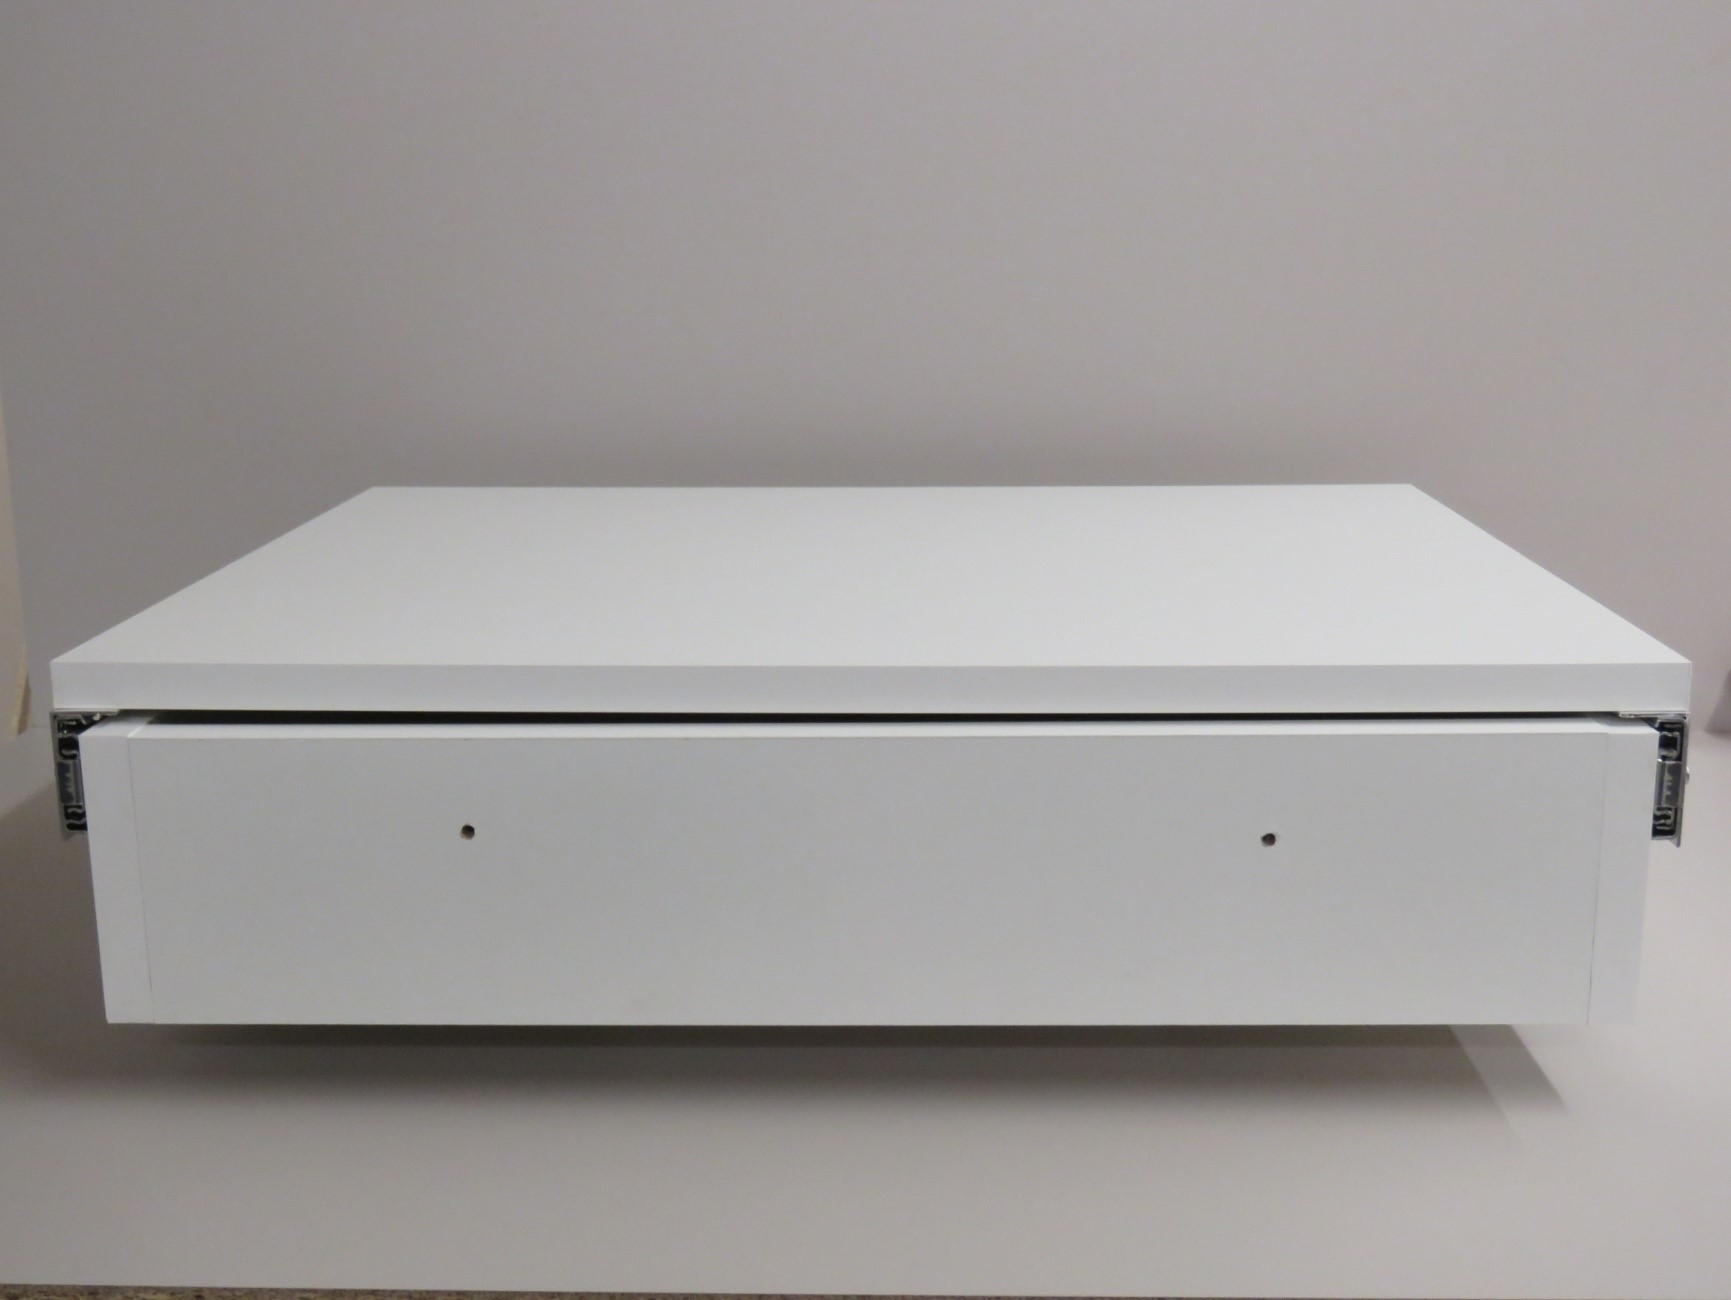 Plinth Box System - 400mm D x 137mm H x for a 600mm Wide Unit